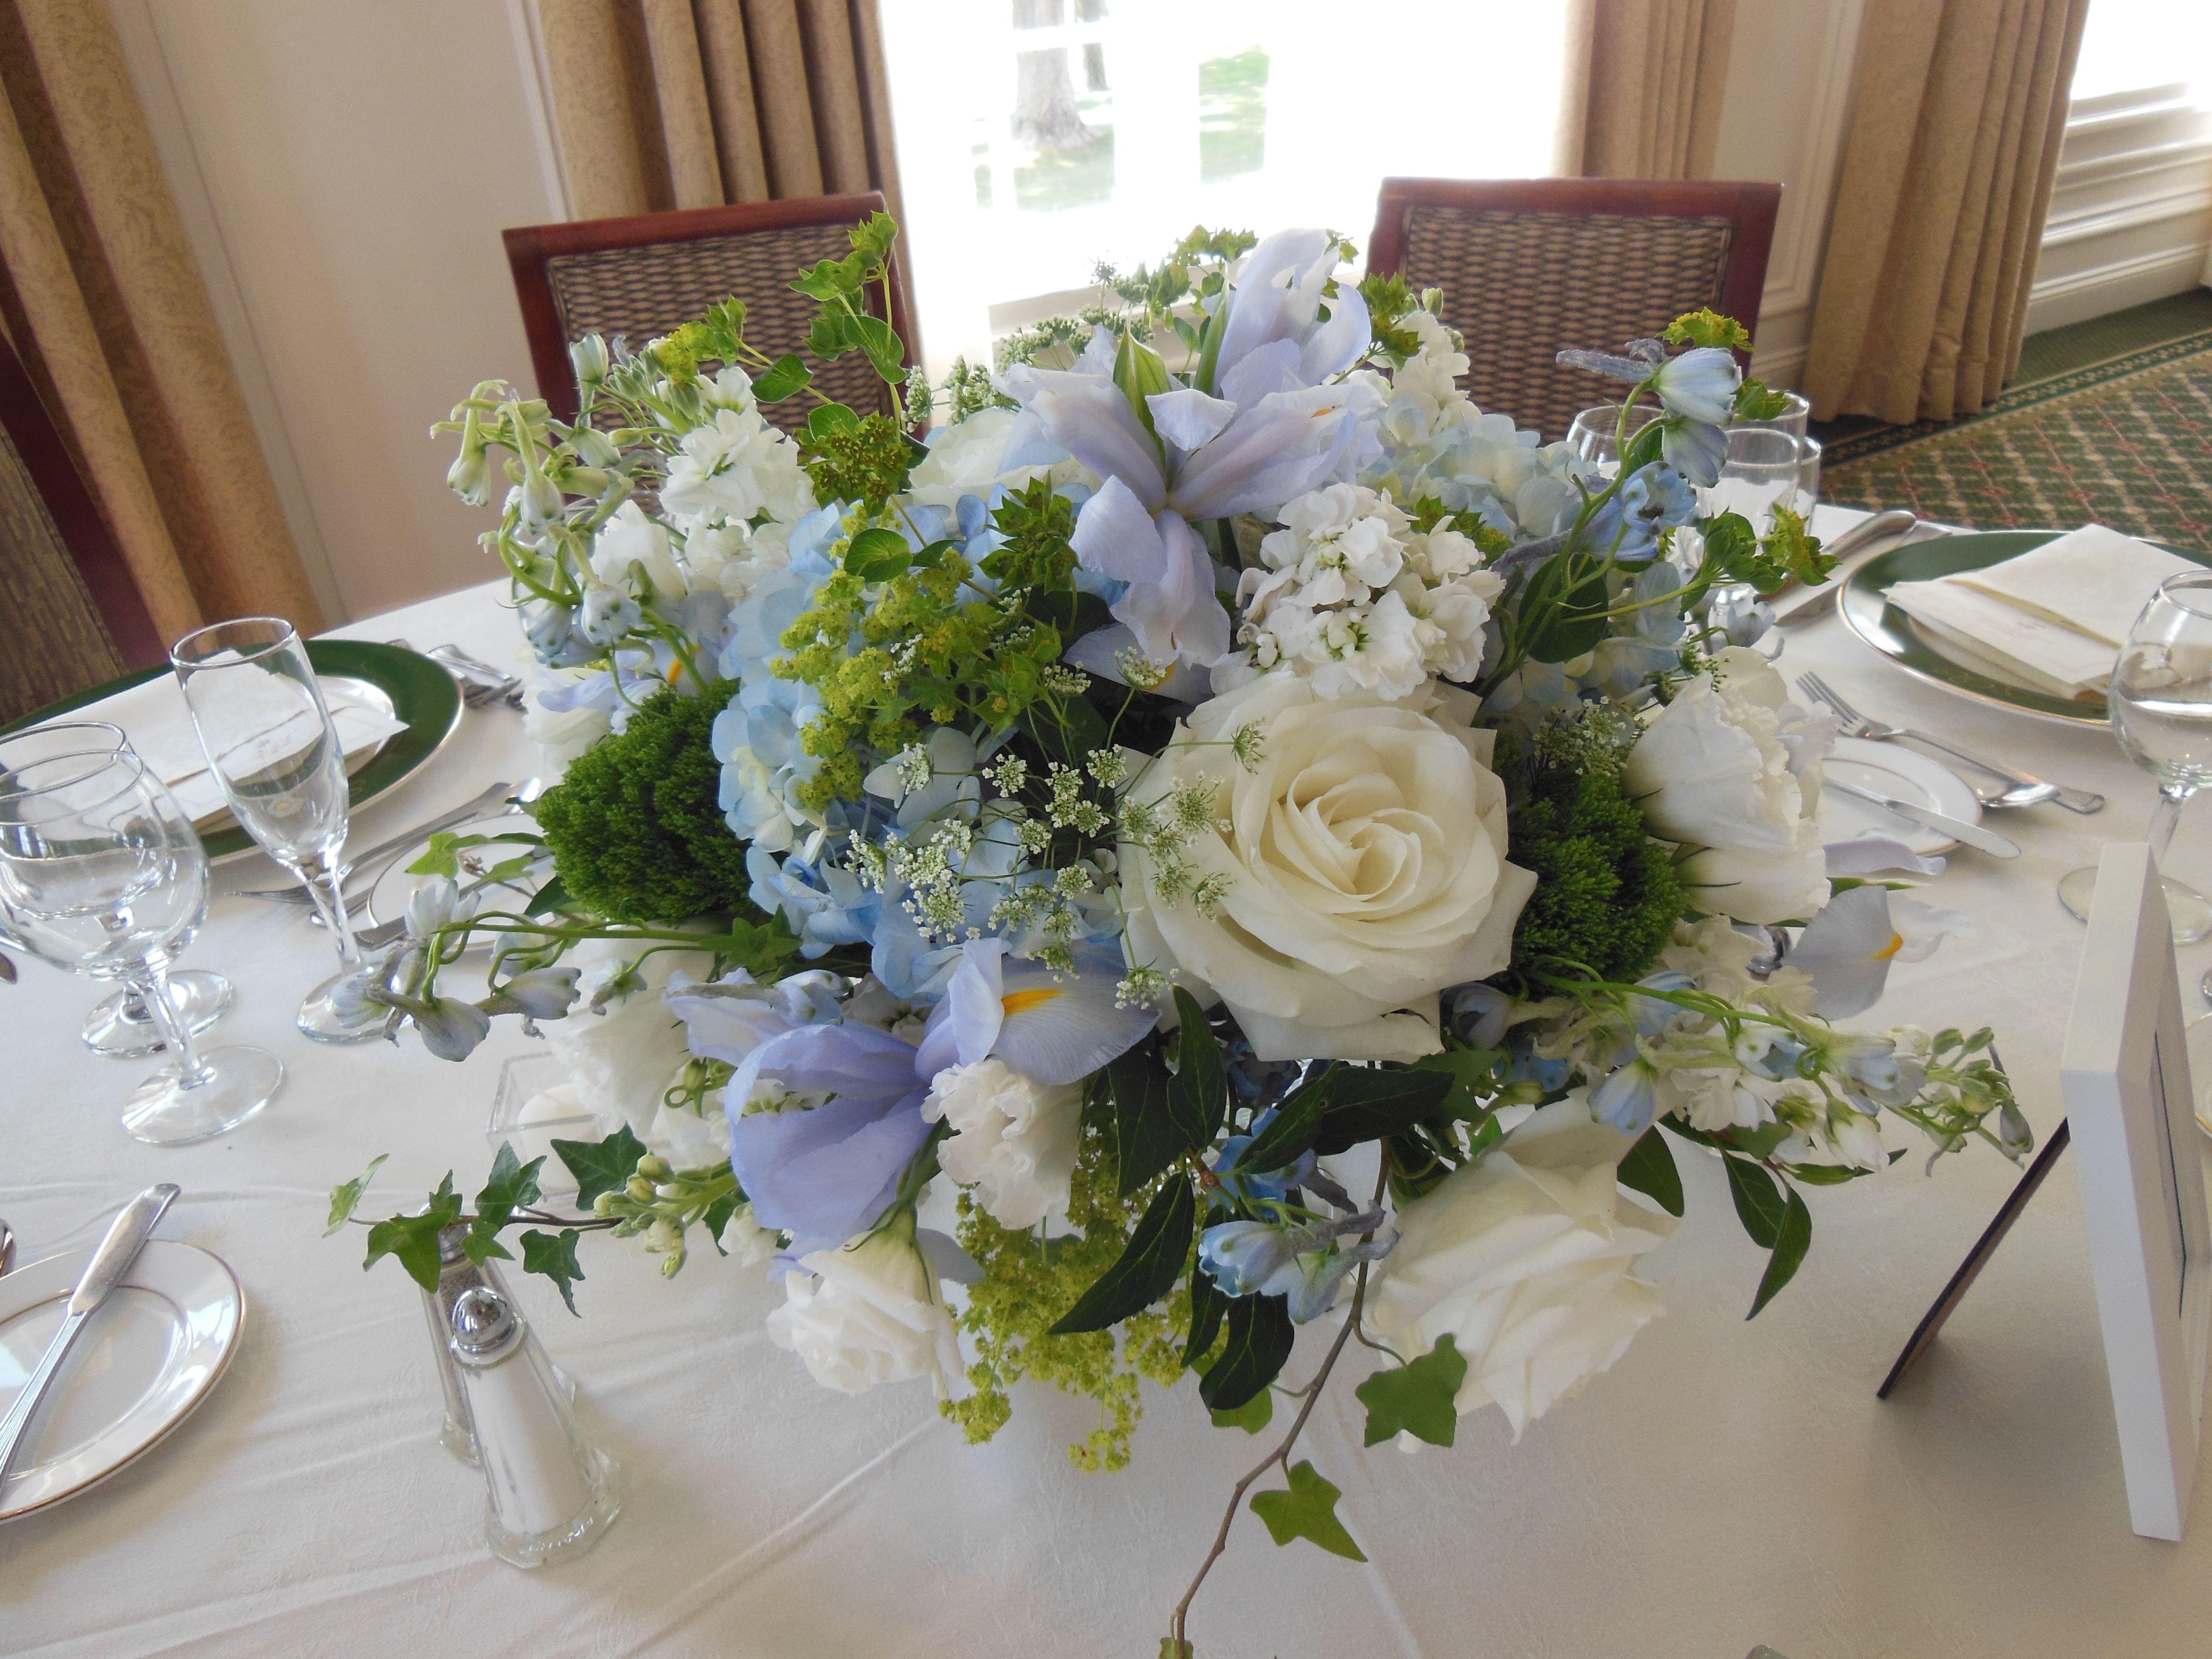 Wedding Reception Flowers Bedford Village Florist Westchester New York Blue And White Wedding Reception Flowers Spring Wedding Flowers Blue Centerpieces